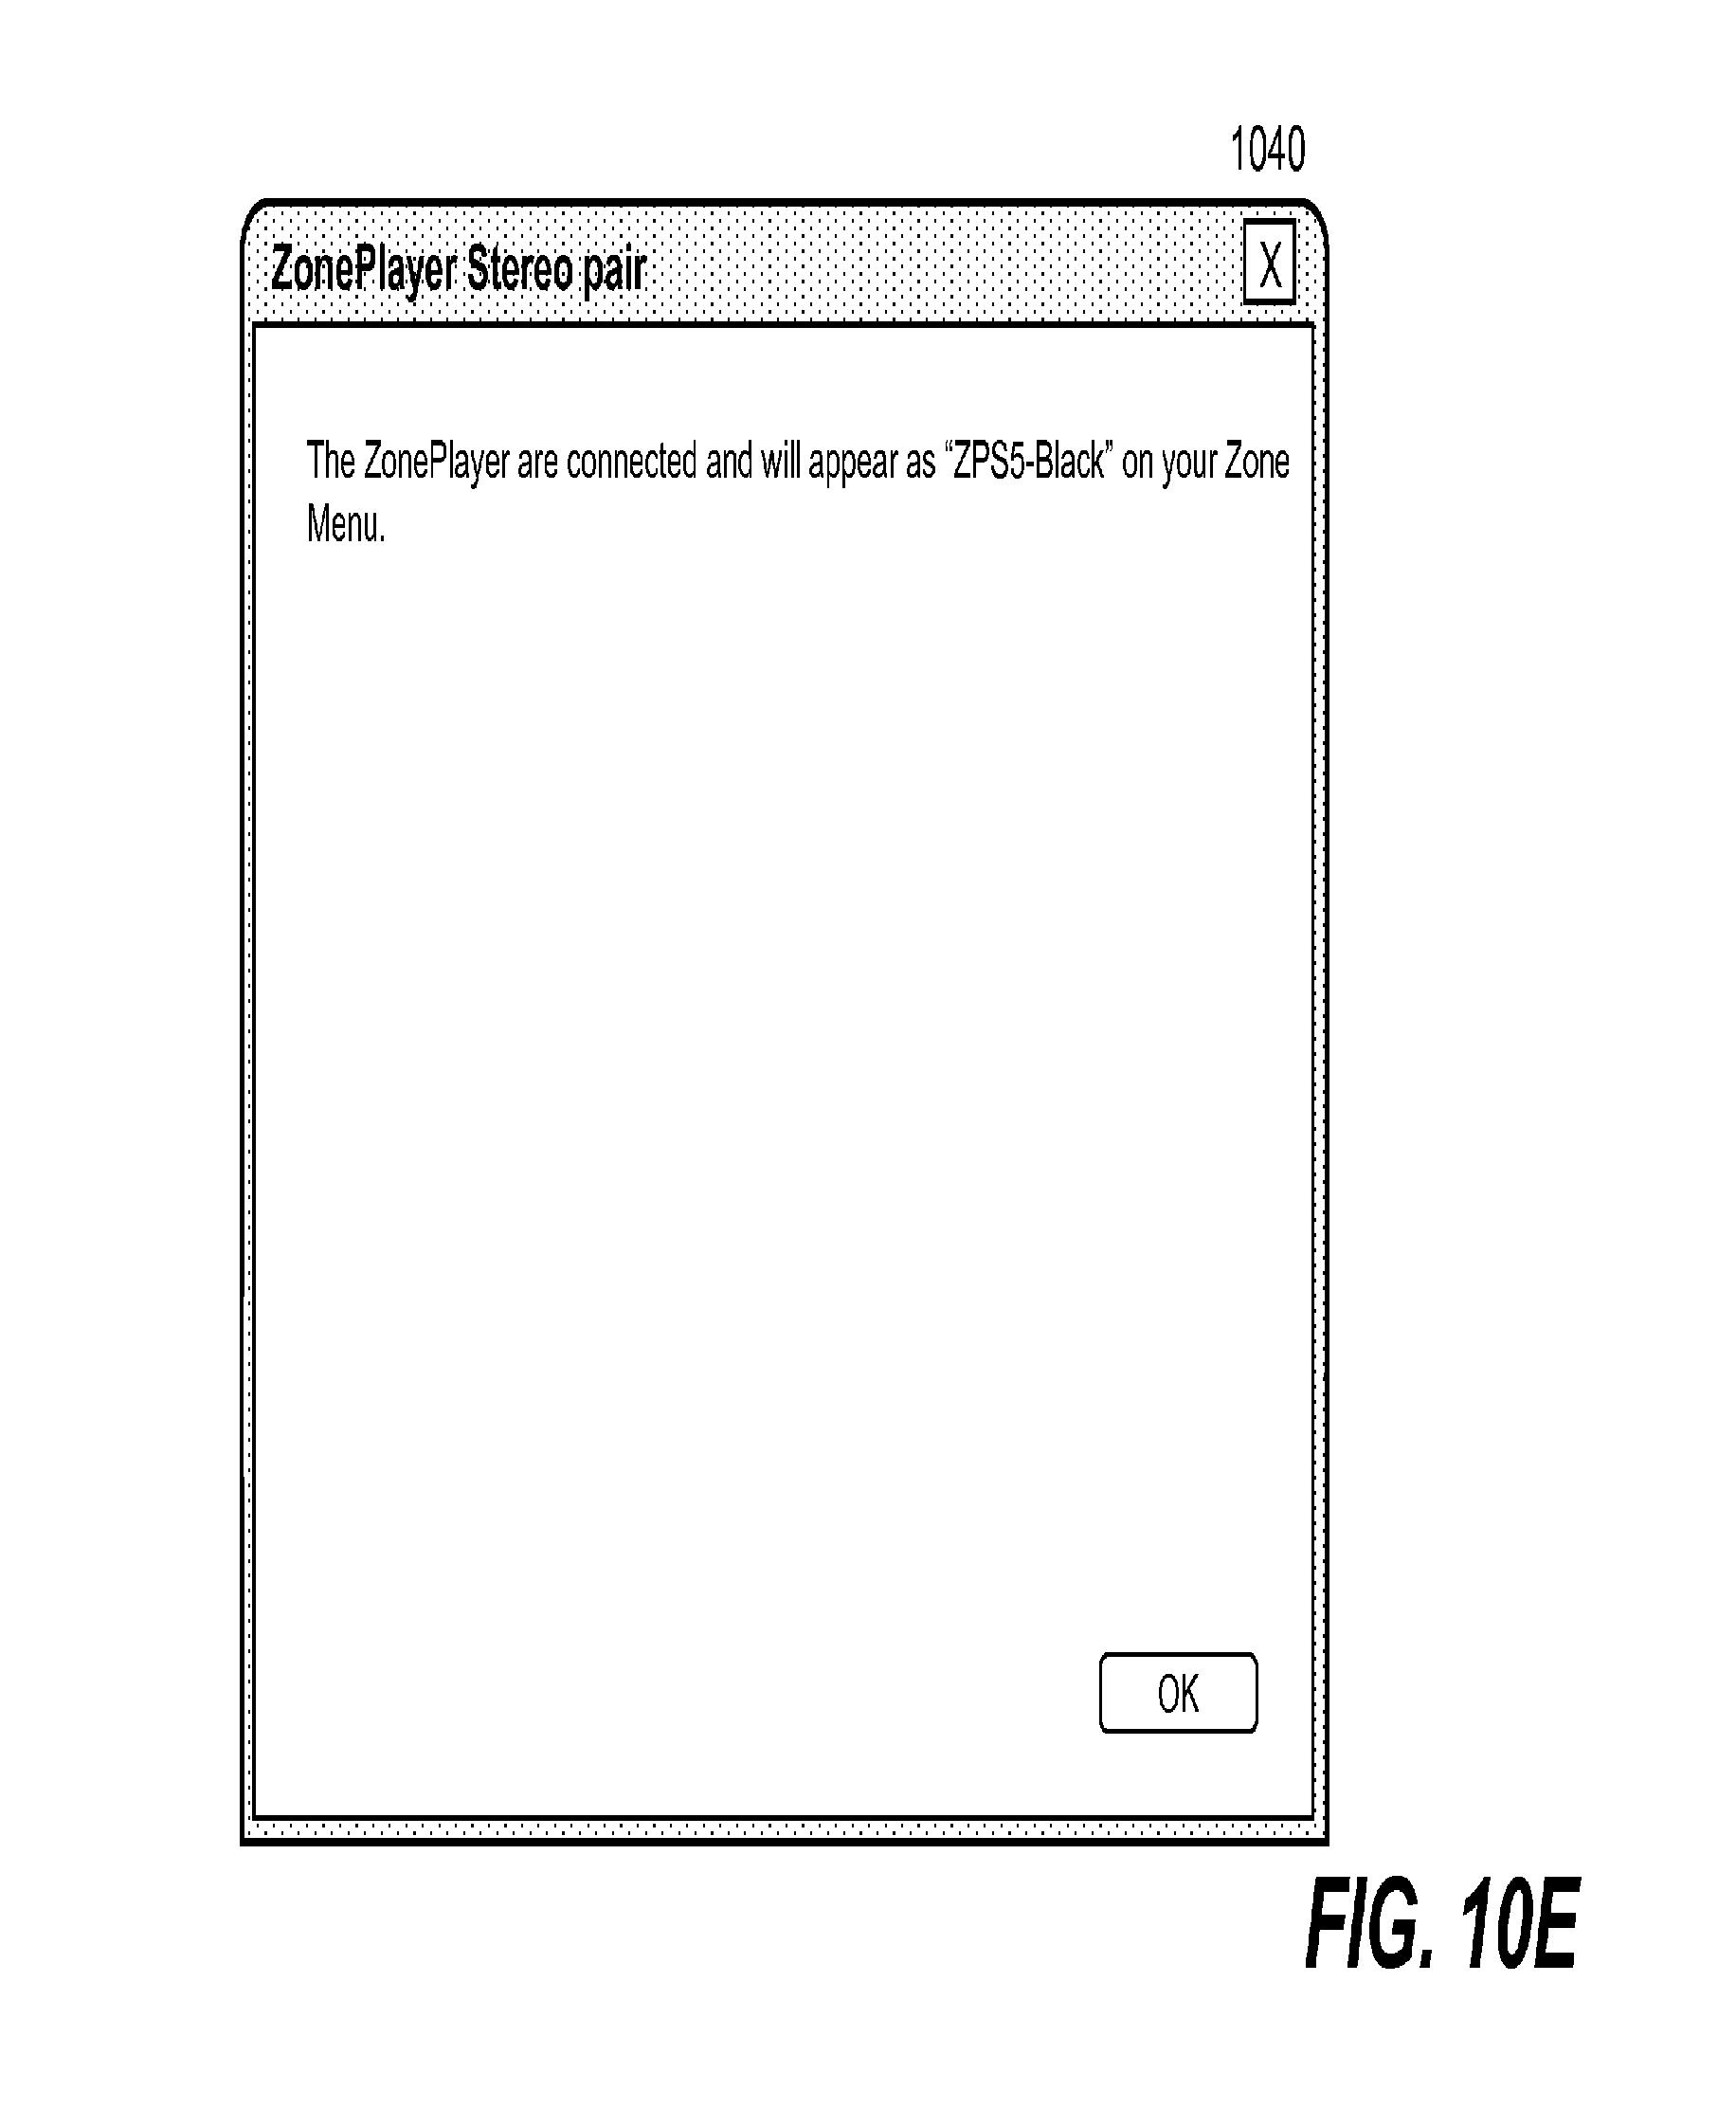 Patent US 9,756,424 B2